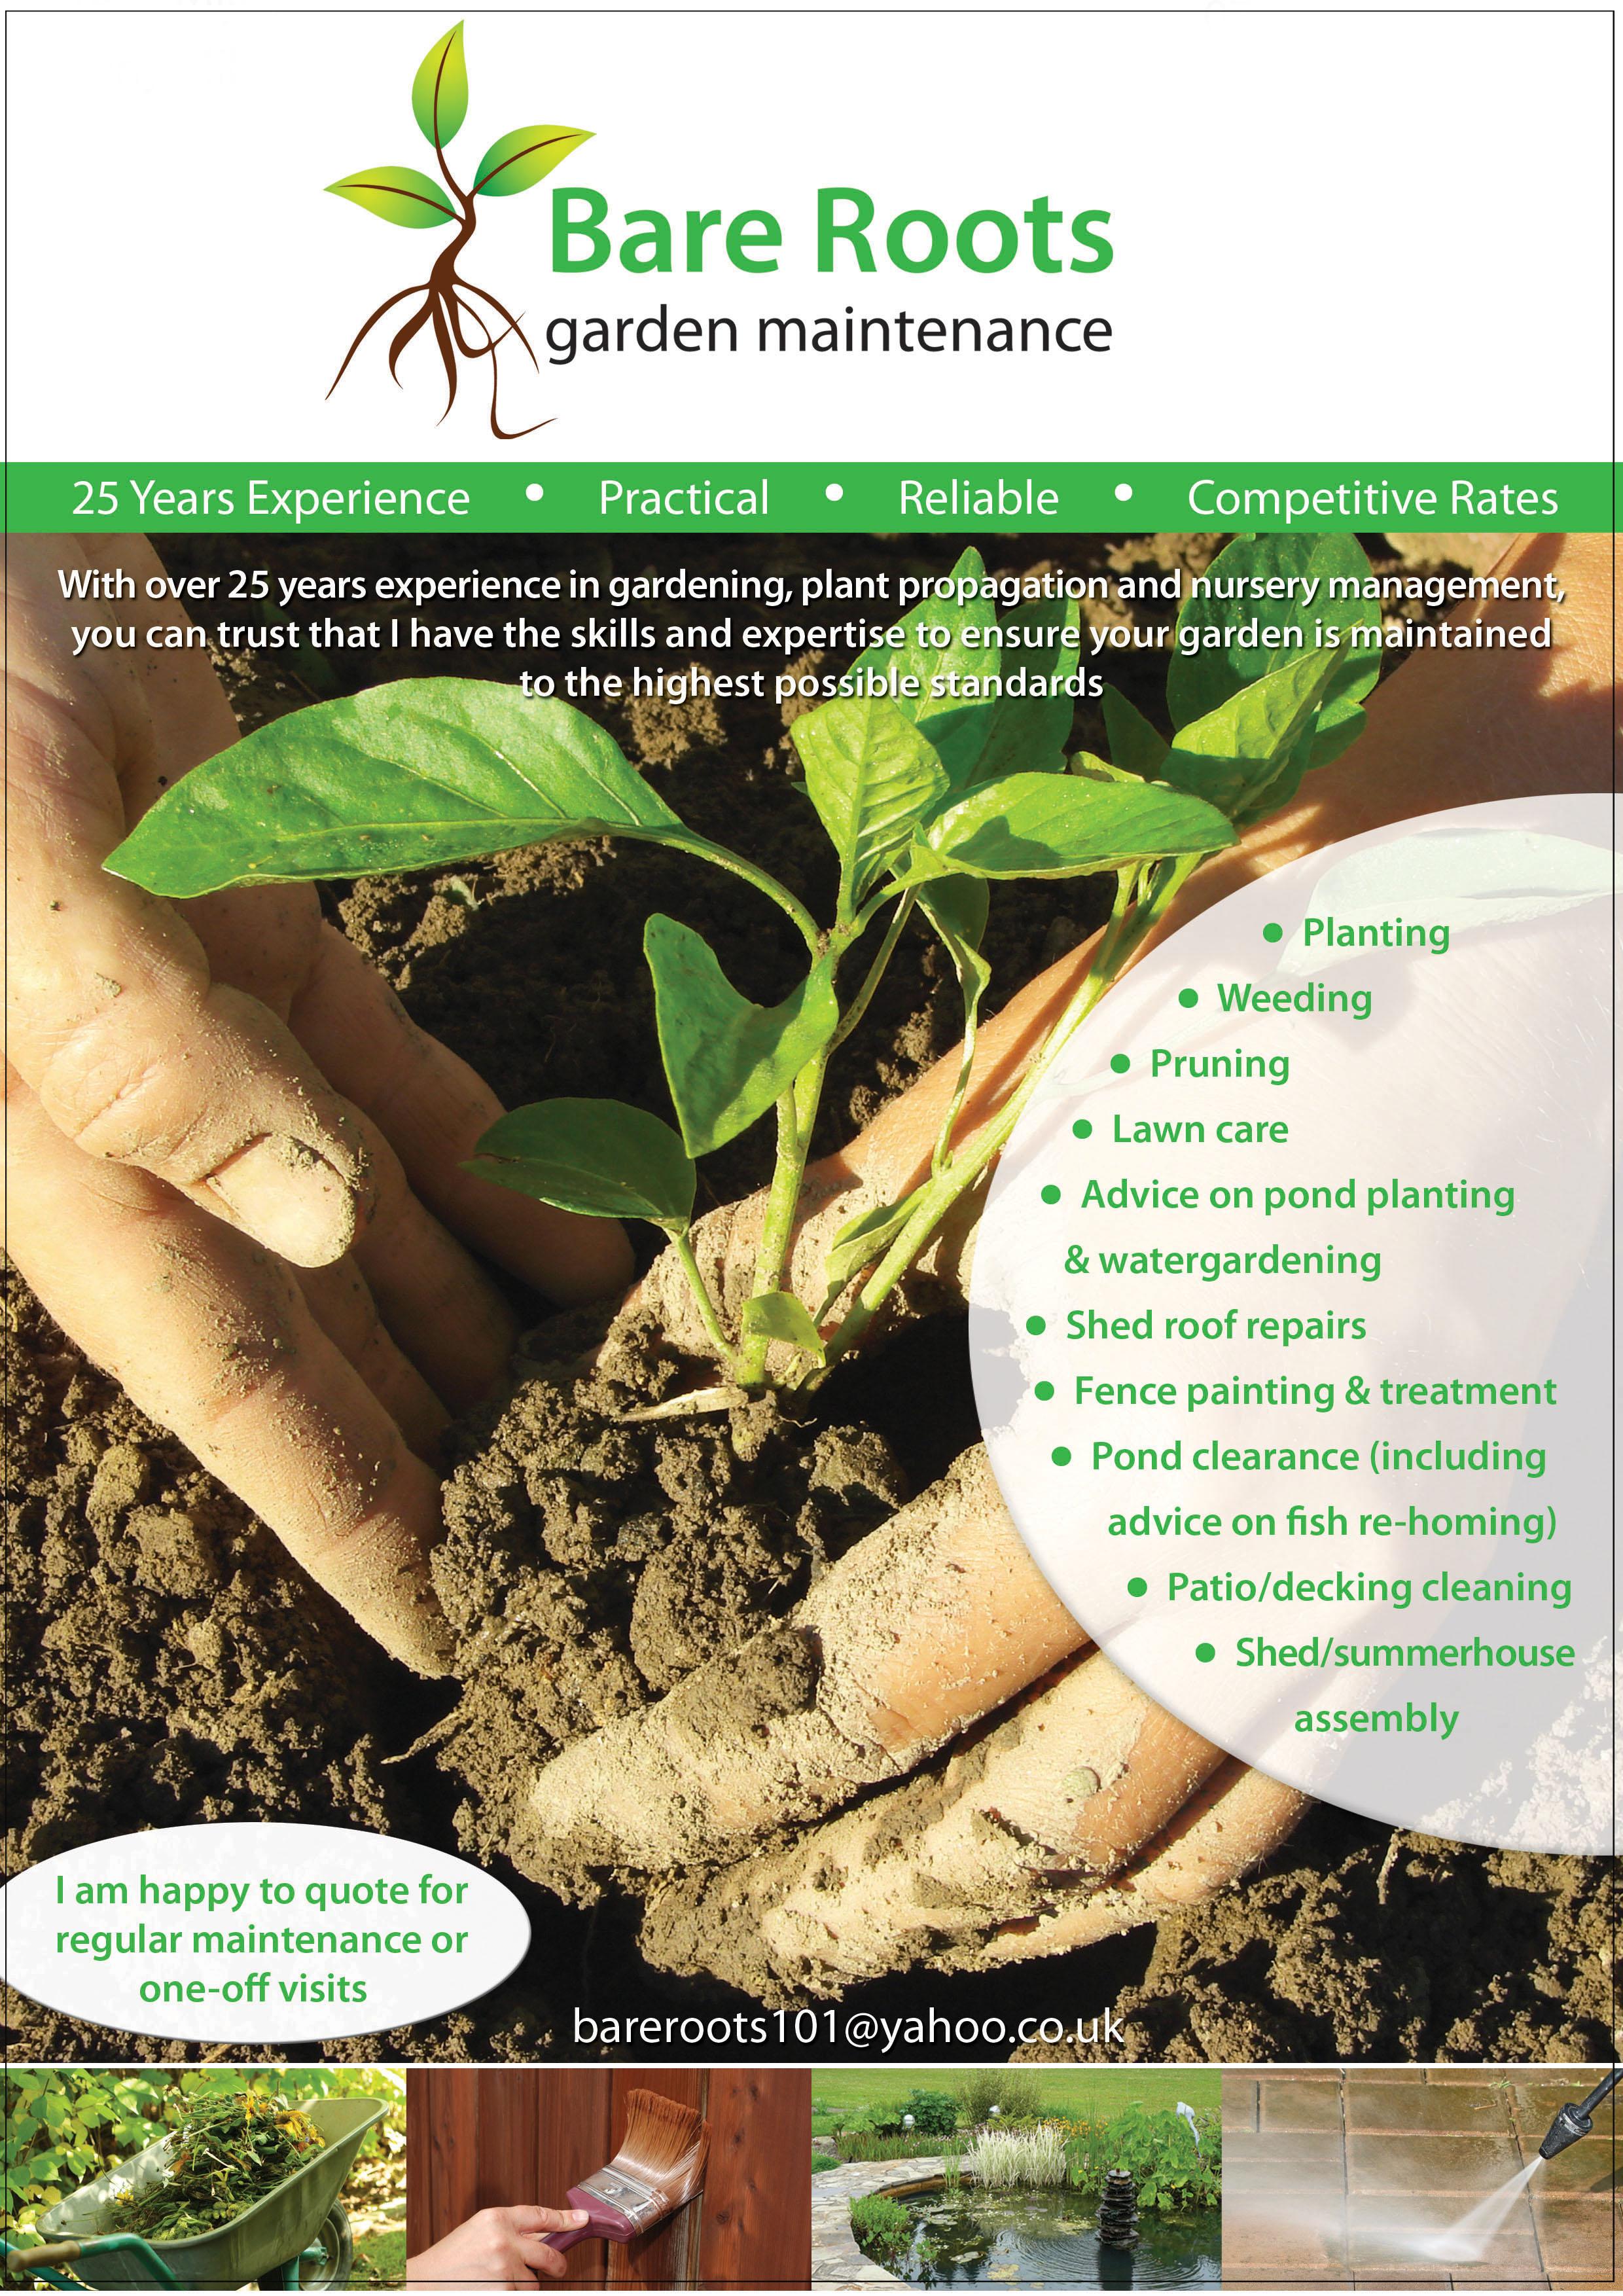 Bare Roots Gardening flyer design